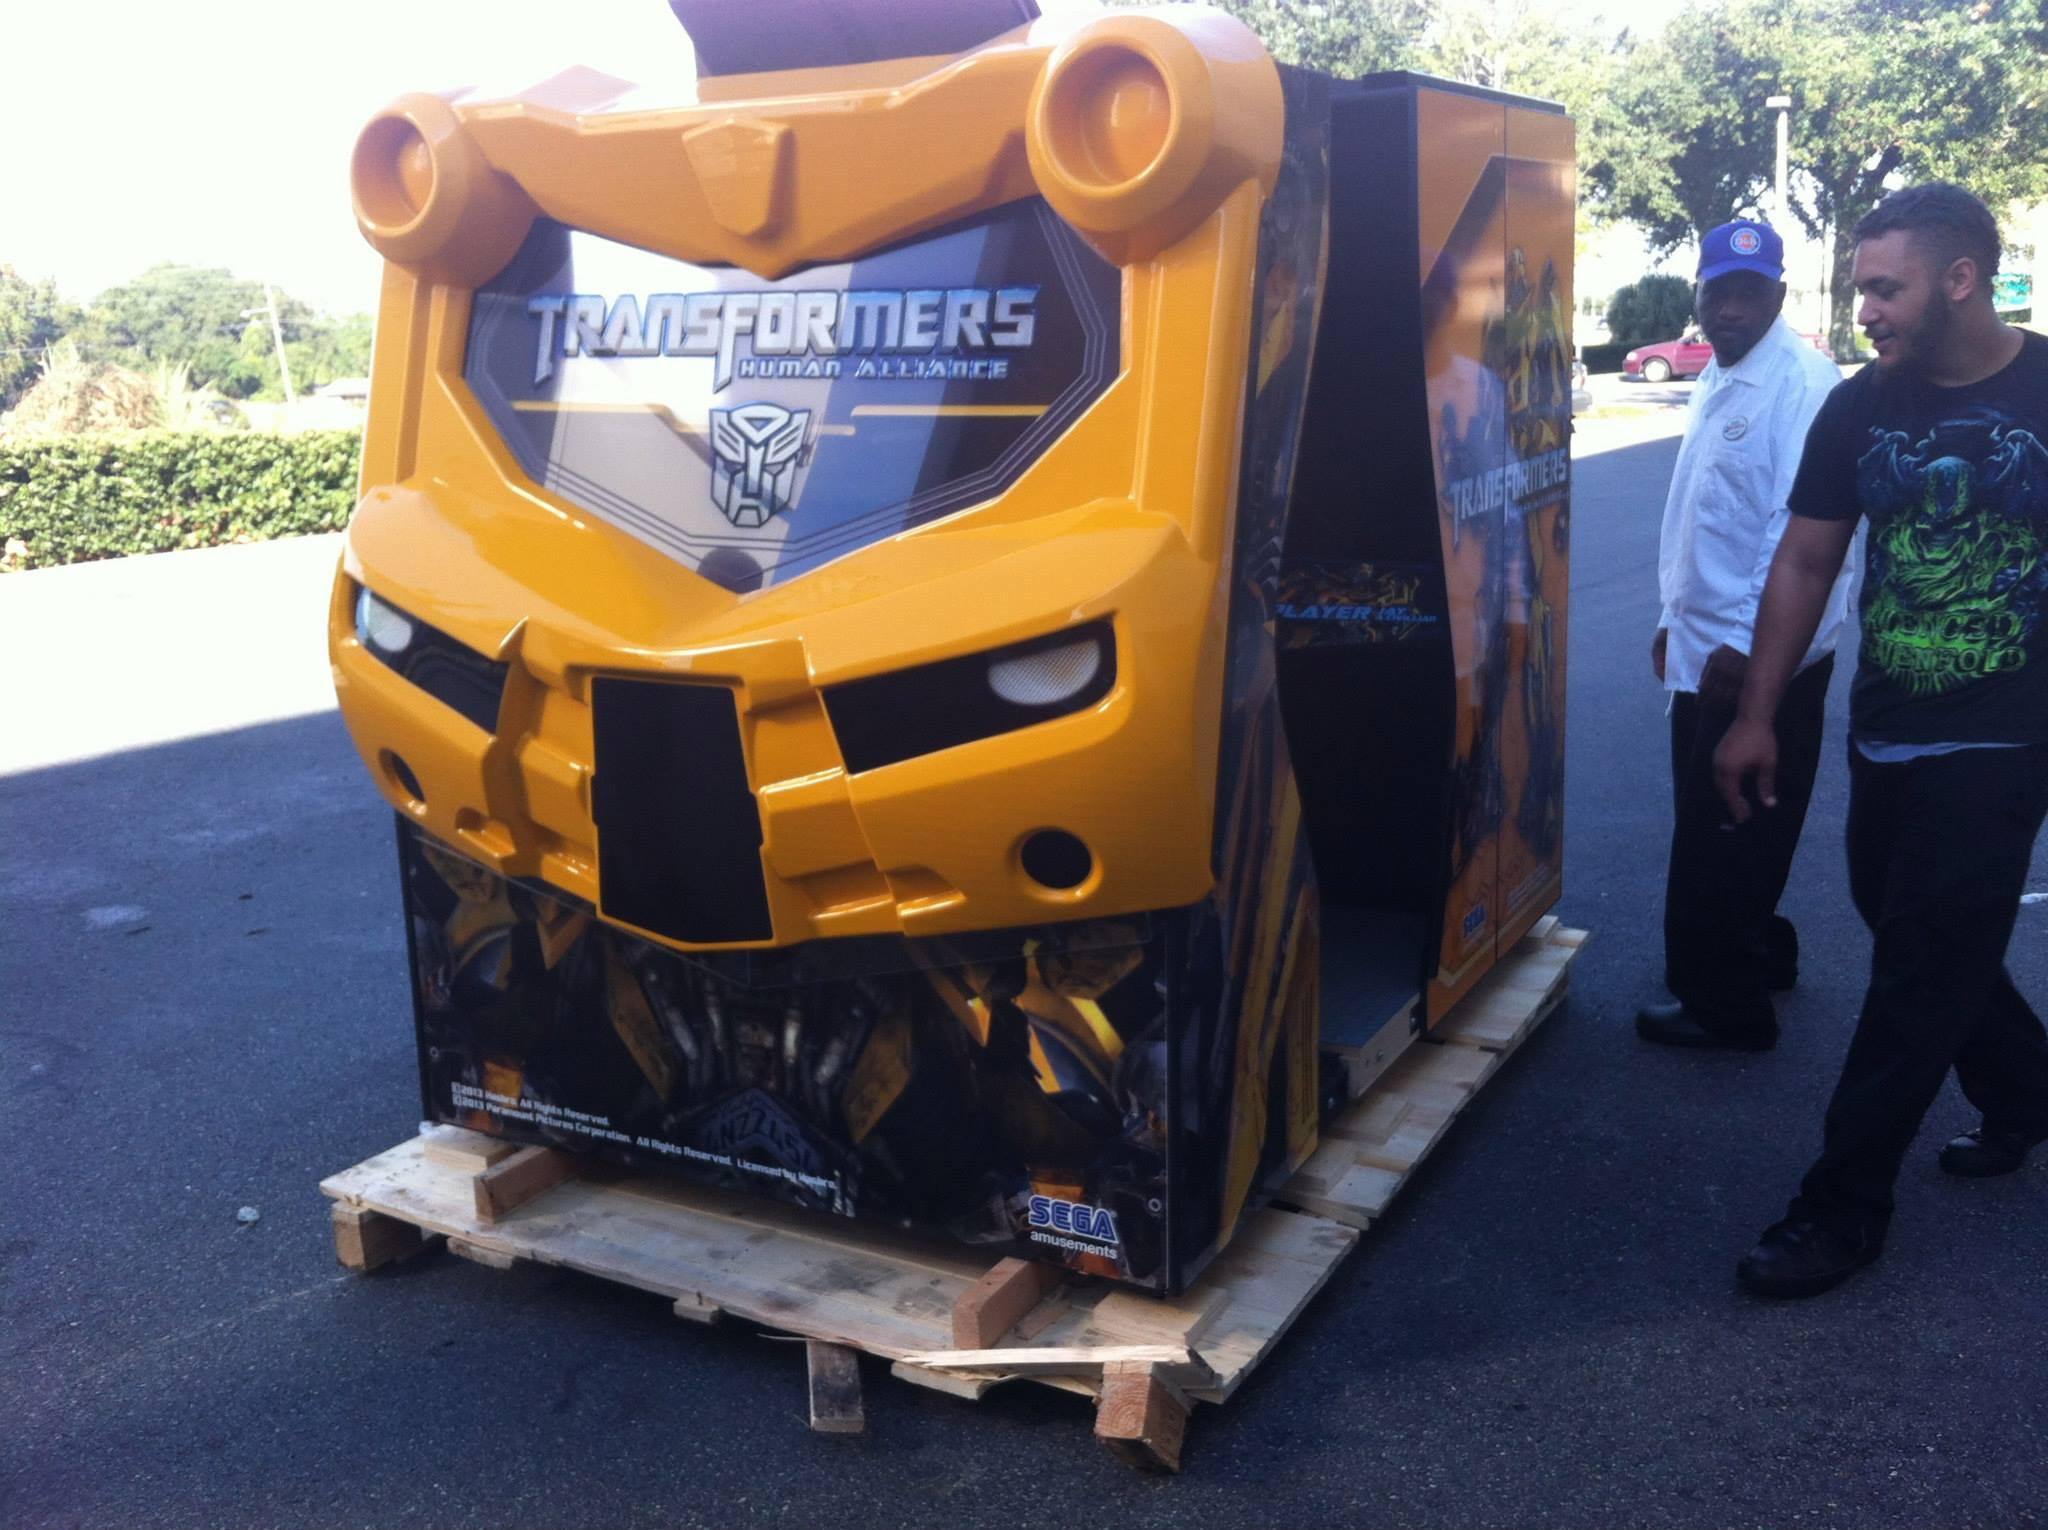 Sega Transformers Human Alliance Arcade Machine | Liberty Games